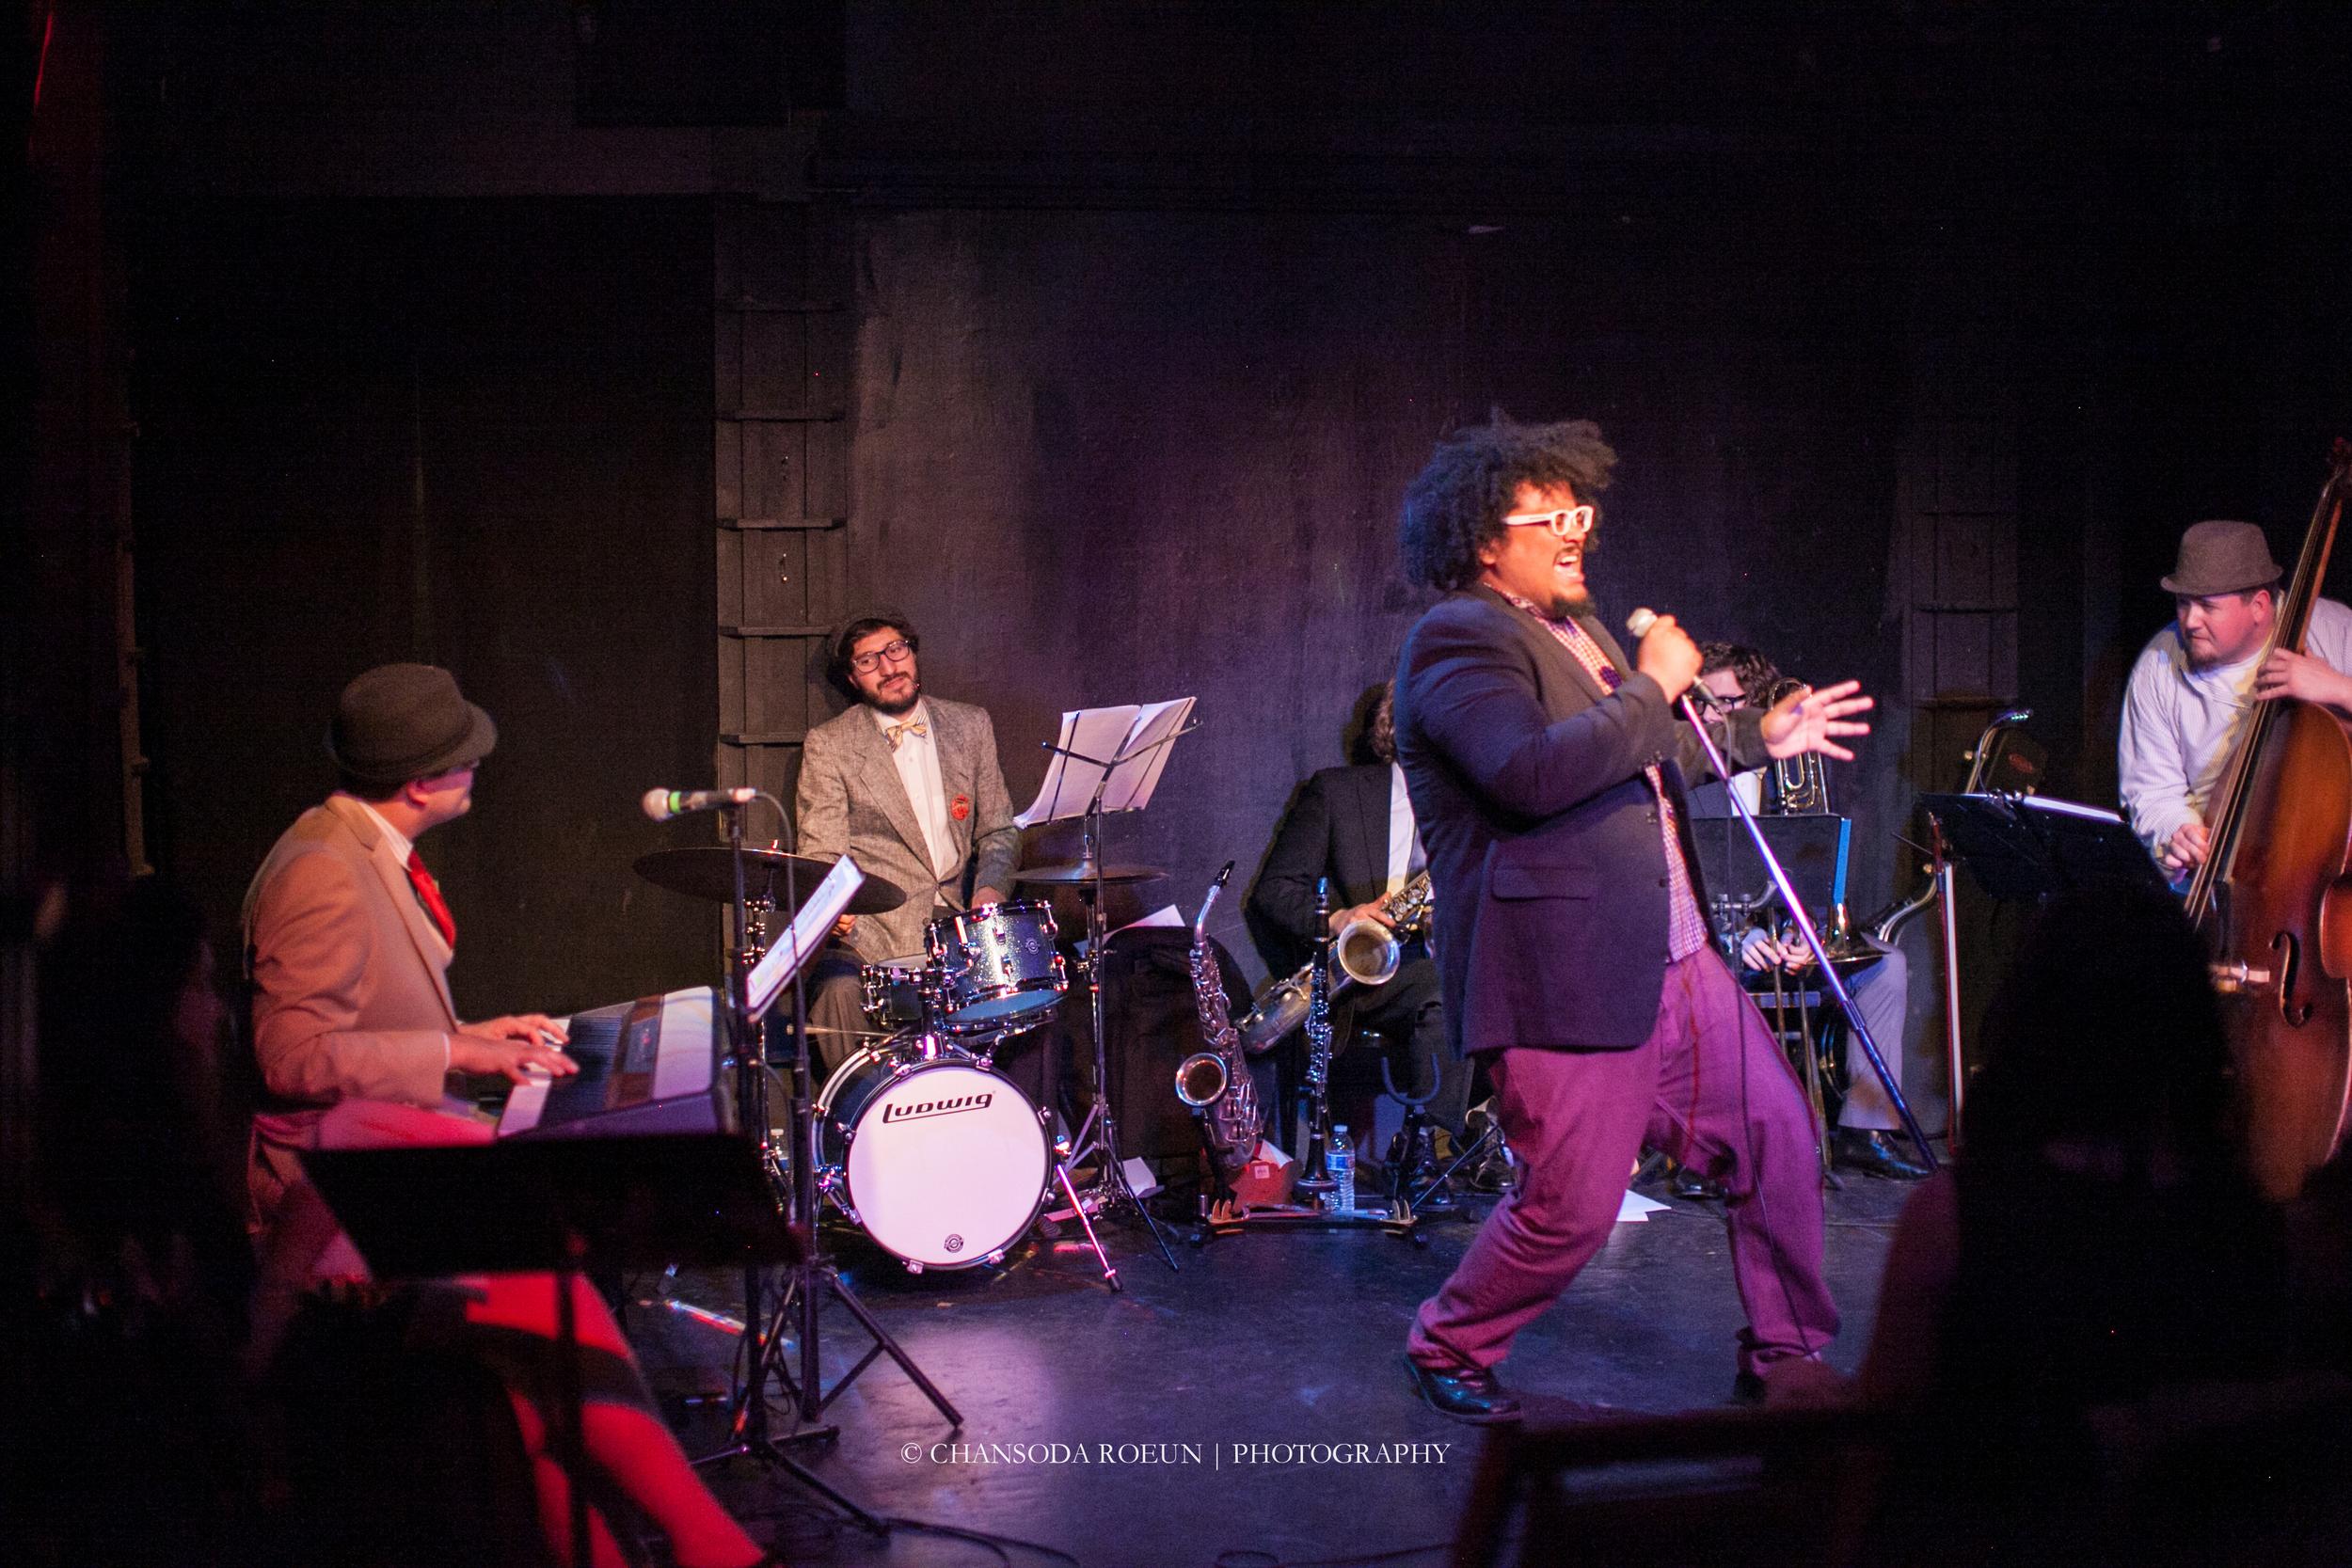 Malachi Nimmons, Jr with The Swingaroos